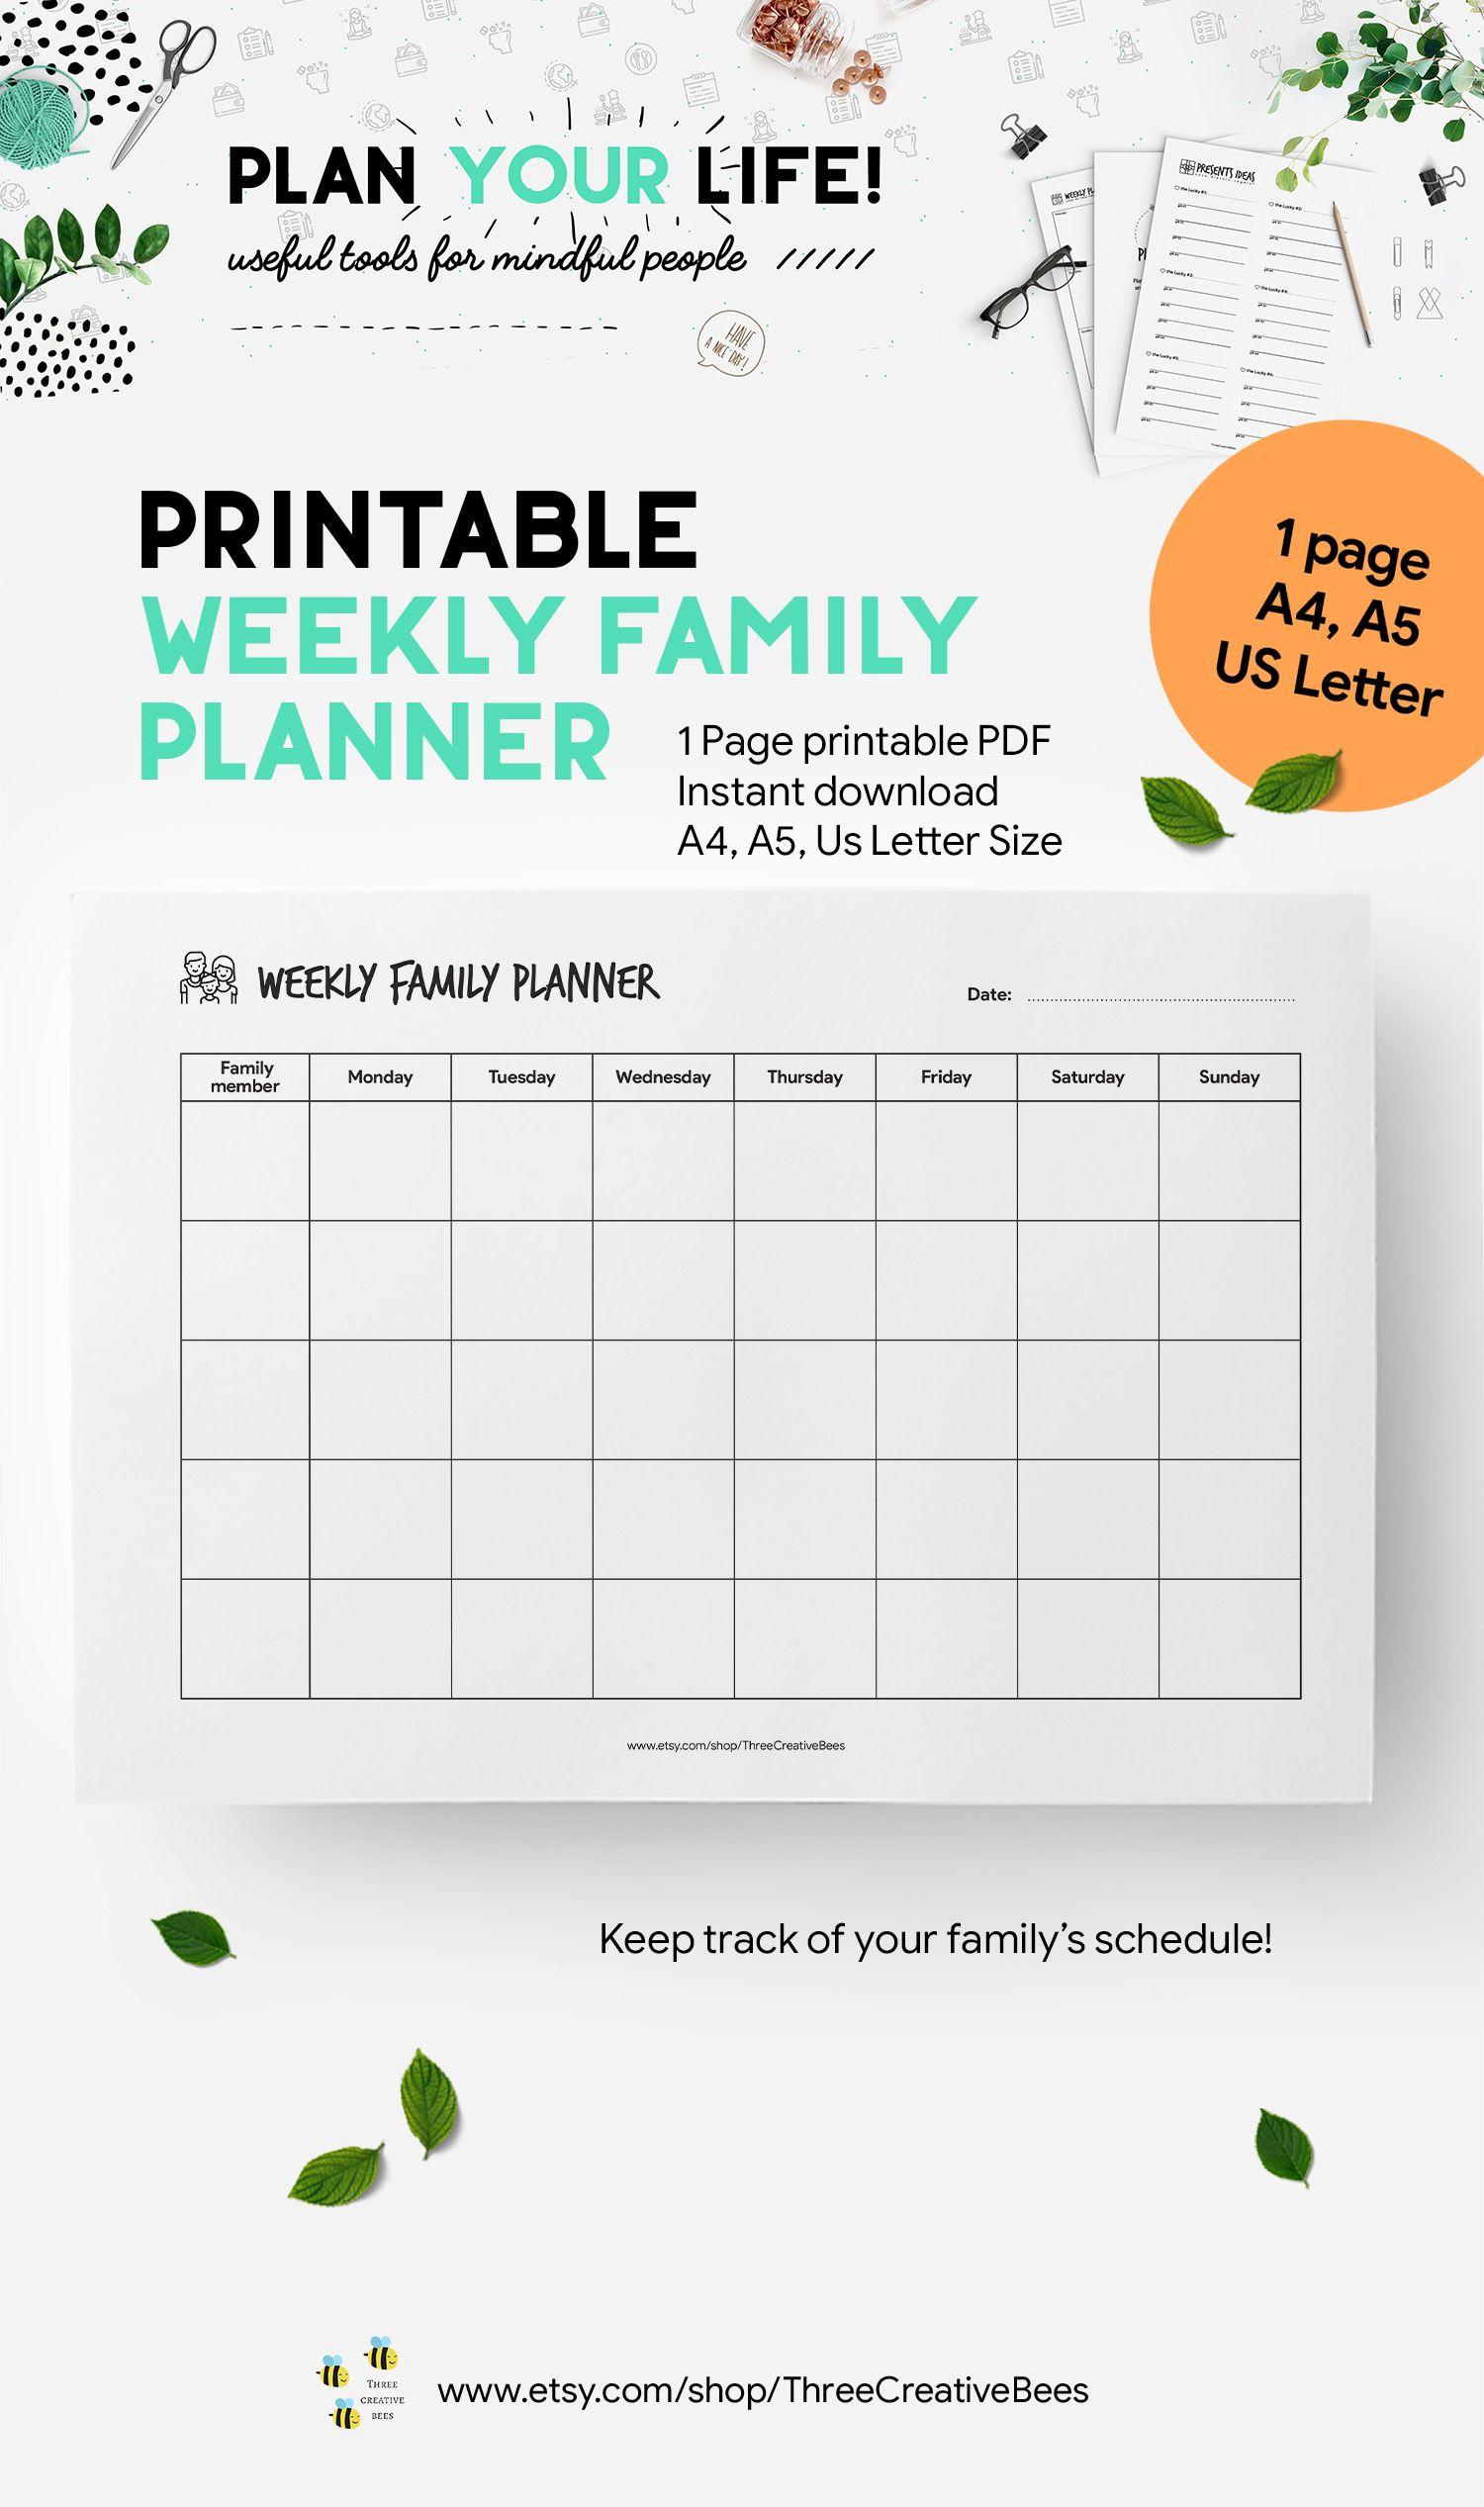 Calendario Flylady.Printable Weekly Family Planner Weekly Family Calendar